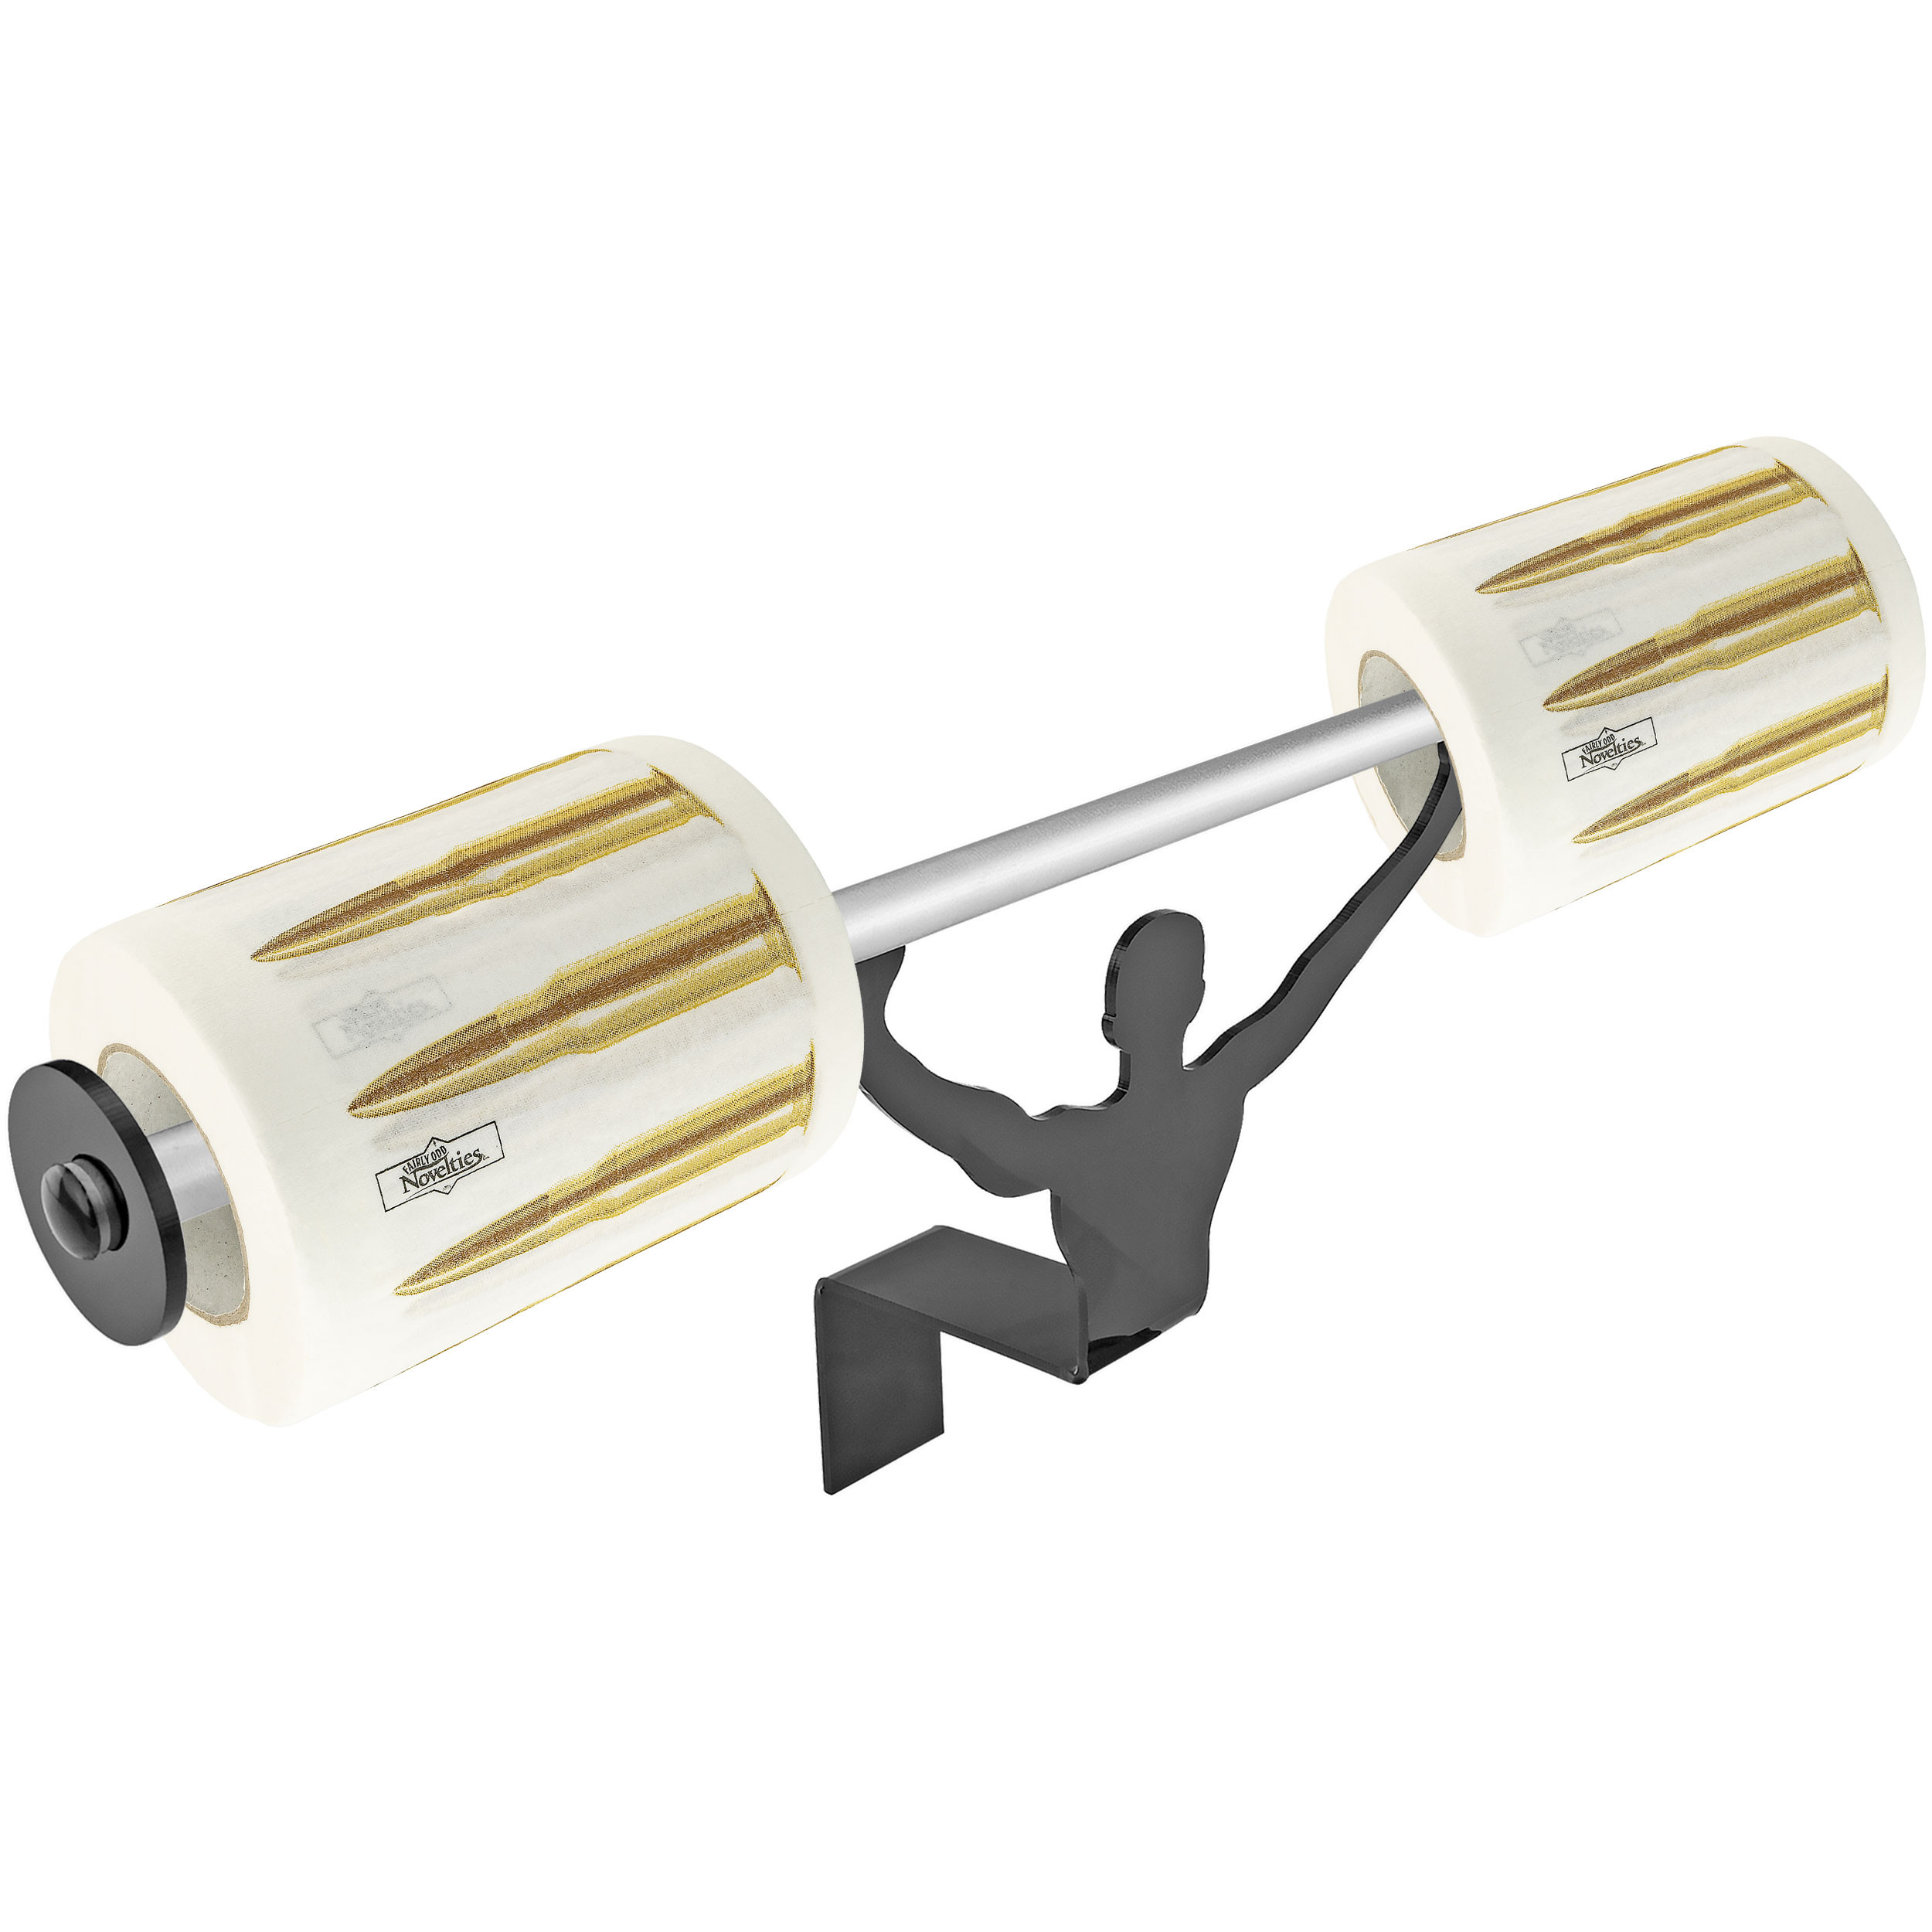 Fairly Odd Novelties AK47 Bullets Toilet Paper with Strong Man Holder Gift Set